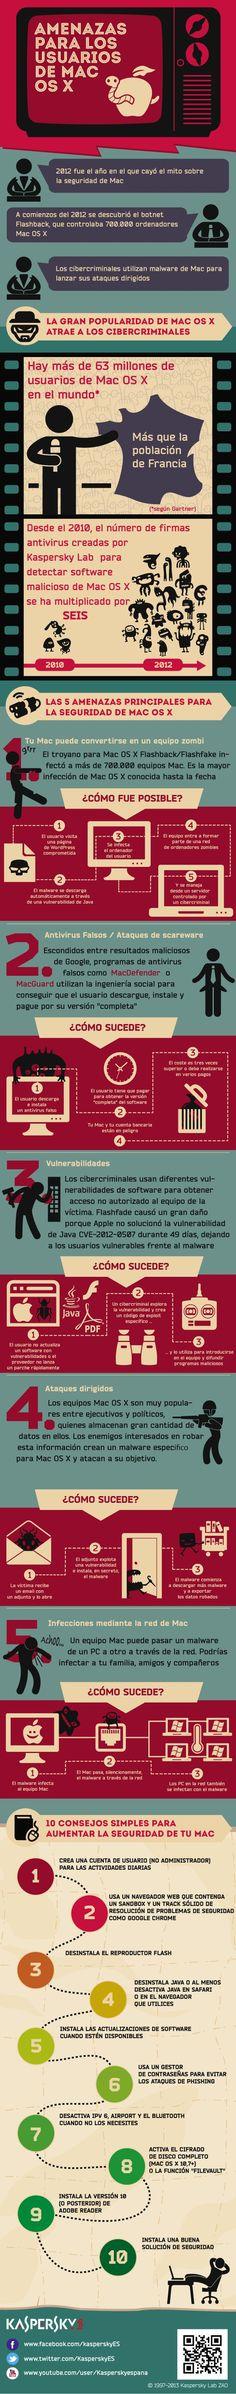 Amenazas para los usuarios de Mac OS X #infografia #infographic #apple